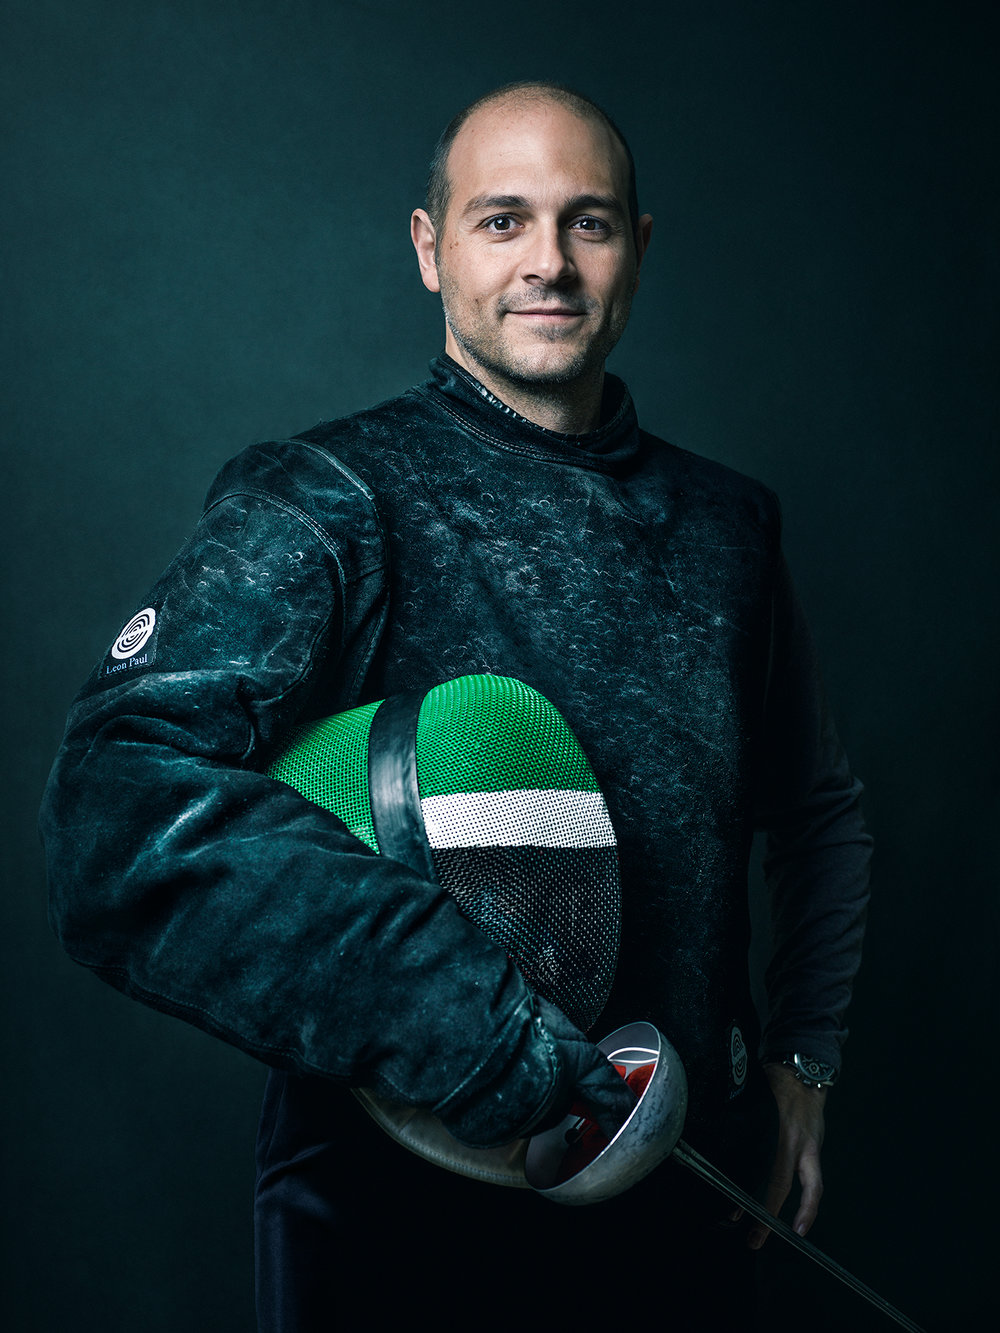 Oscar-arribas-esgrima-maestro-fencing-master-fencer-fechten-scherma-escrime-portrait-fotografo-retrato-photographer023.jpg